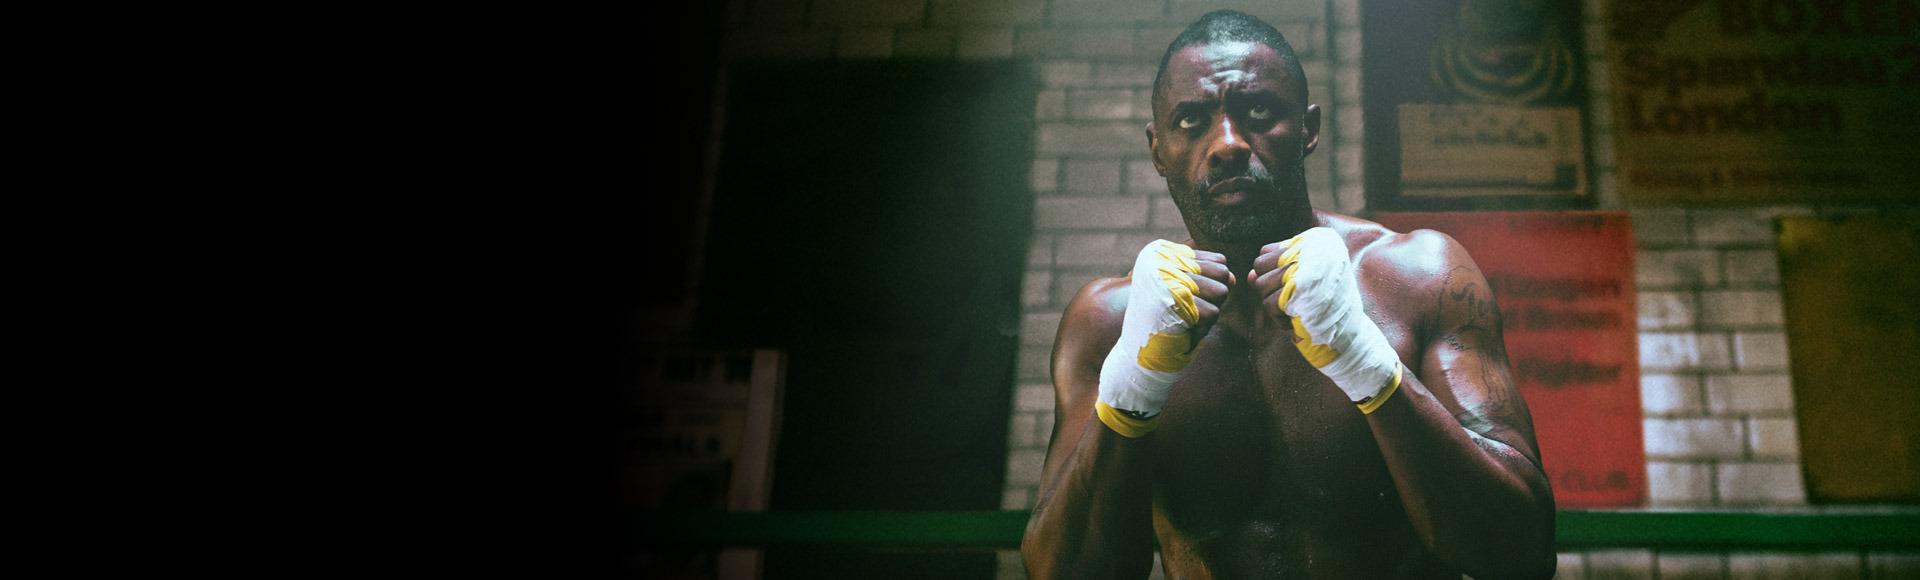 Idris Elba: Dövüşçü